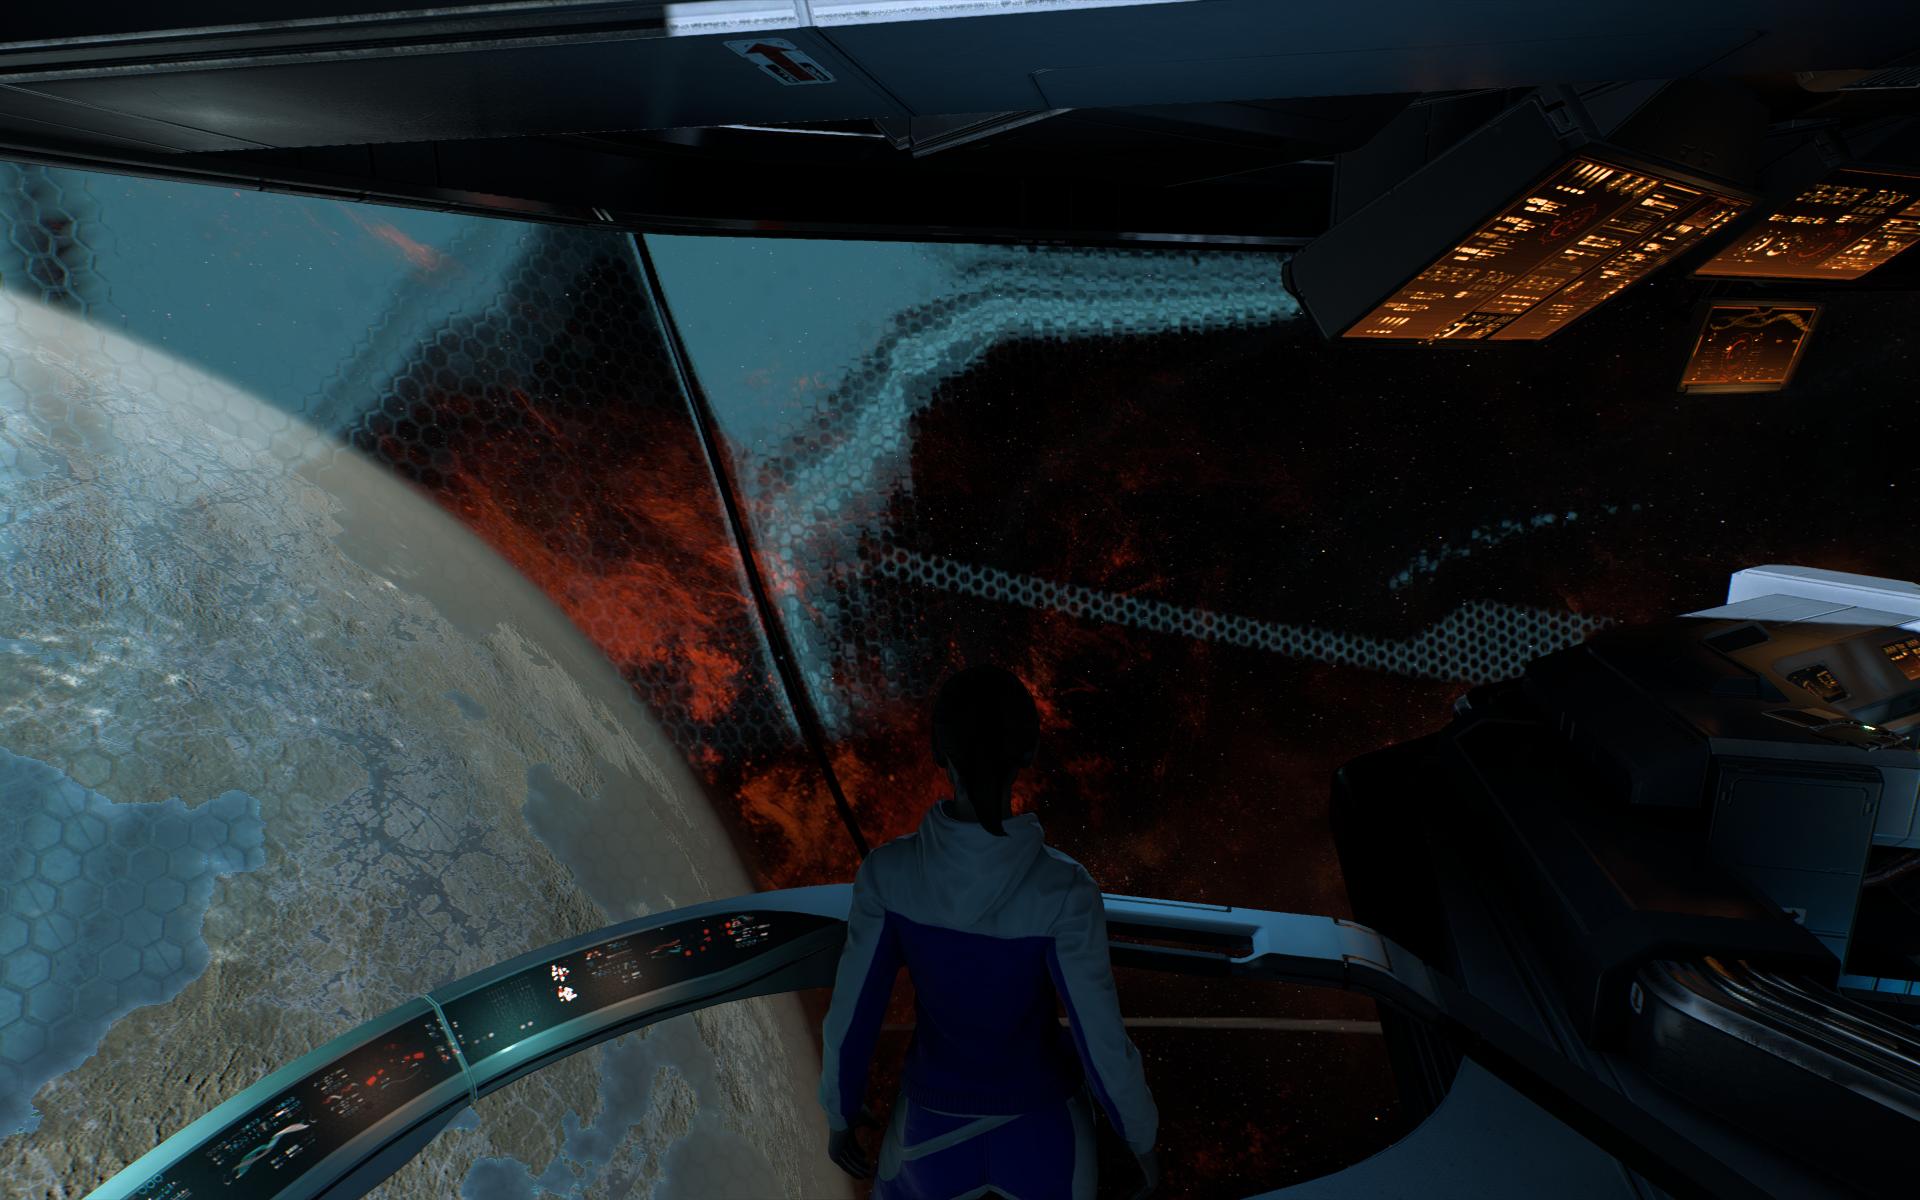 Mass Effect Andromeda Screenshot  - 17.34.19.72.png - Mass Effect: Andromeda